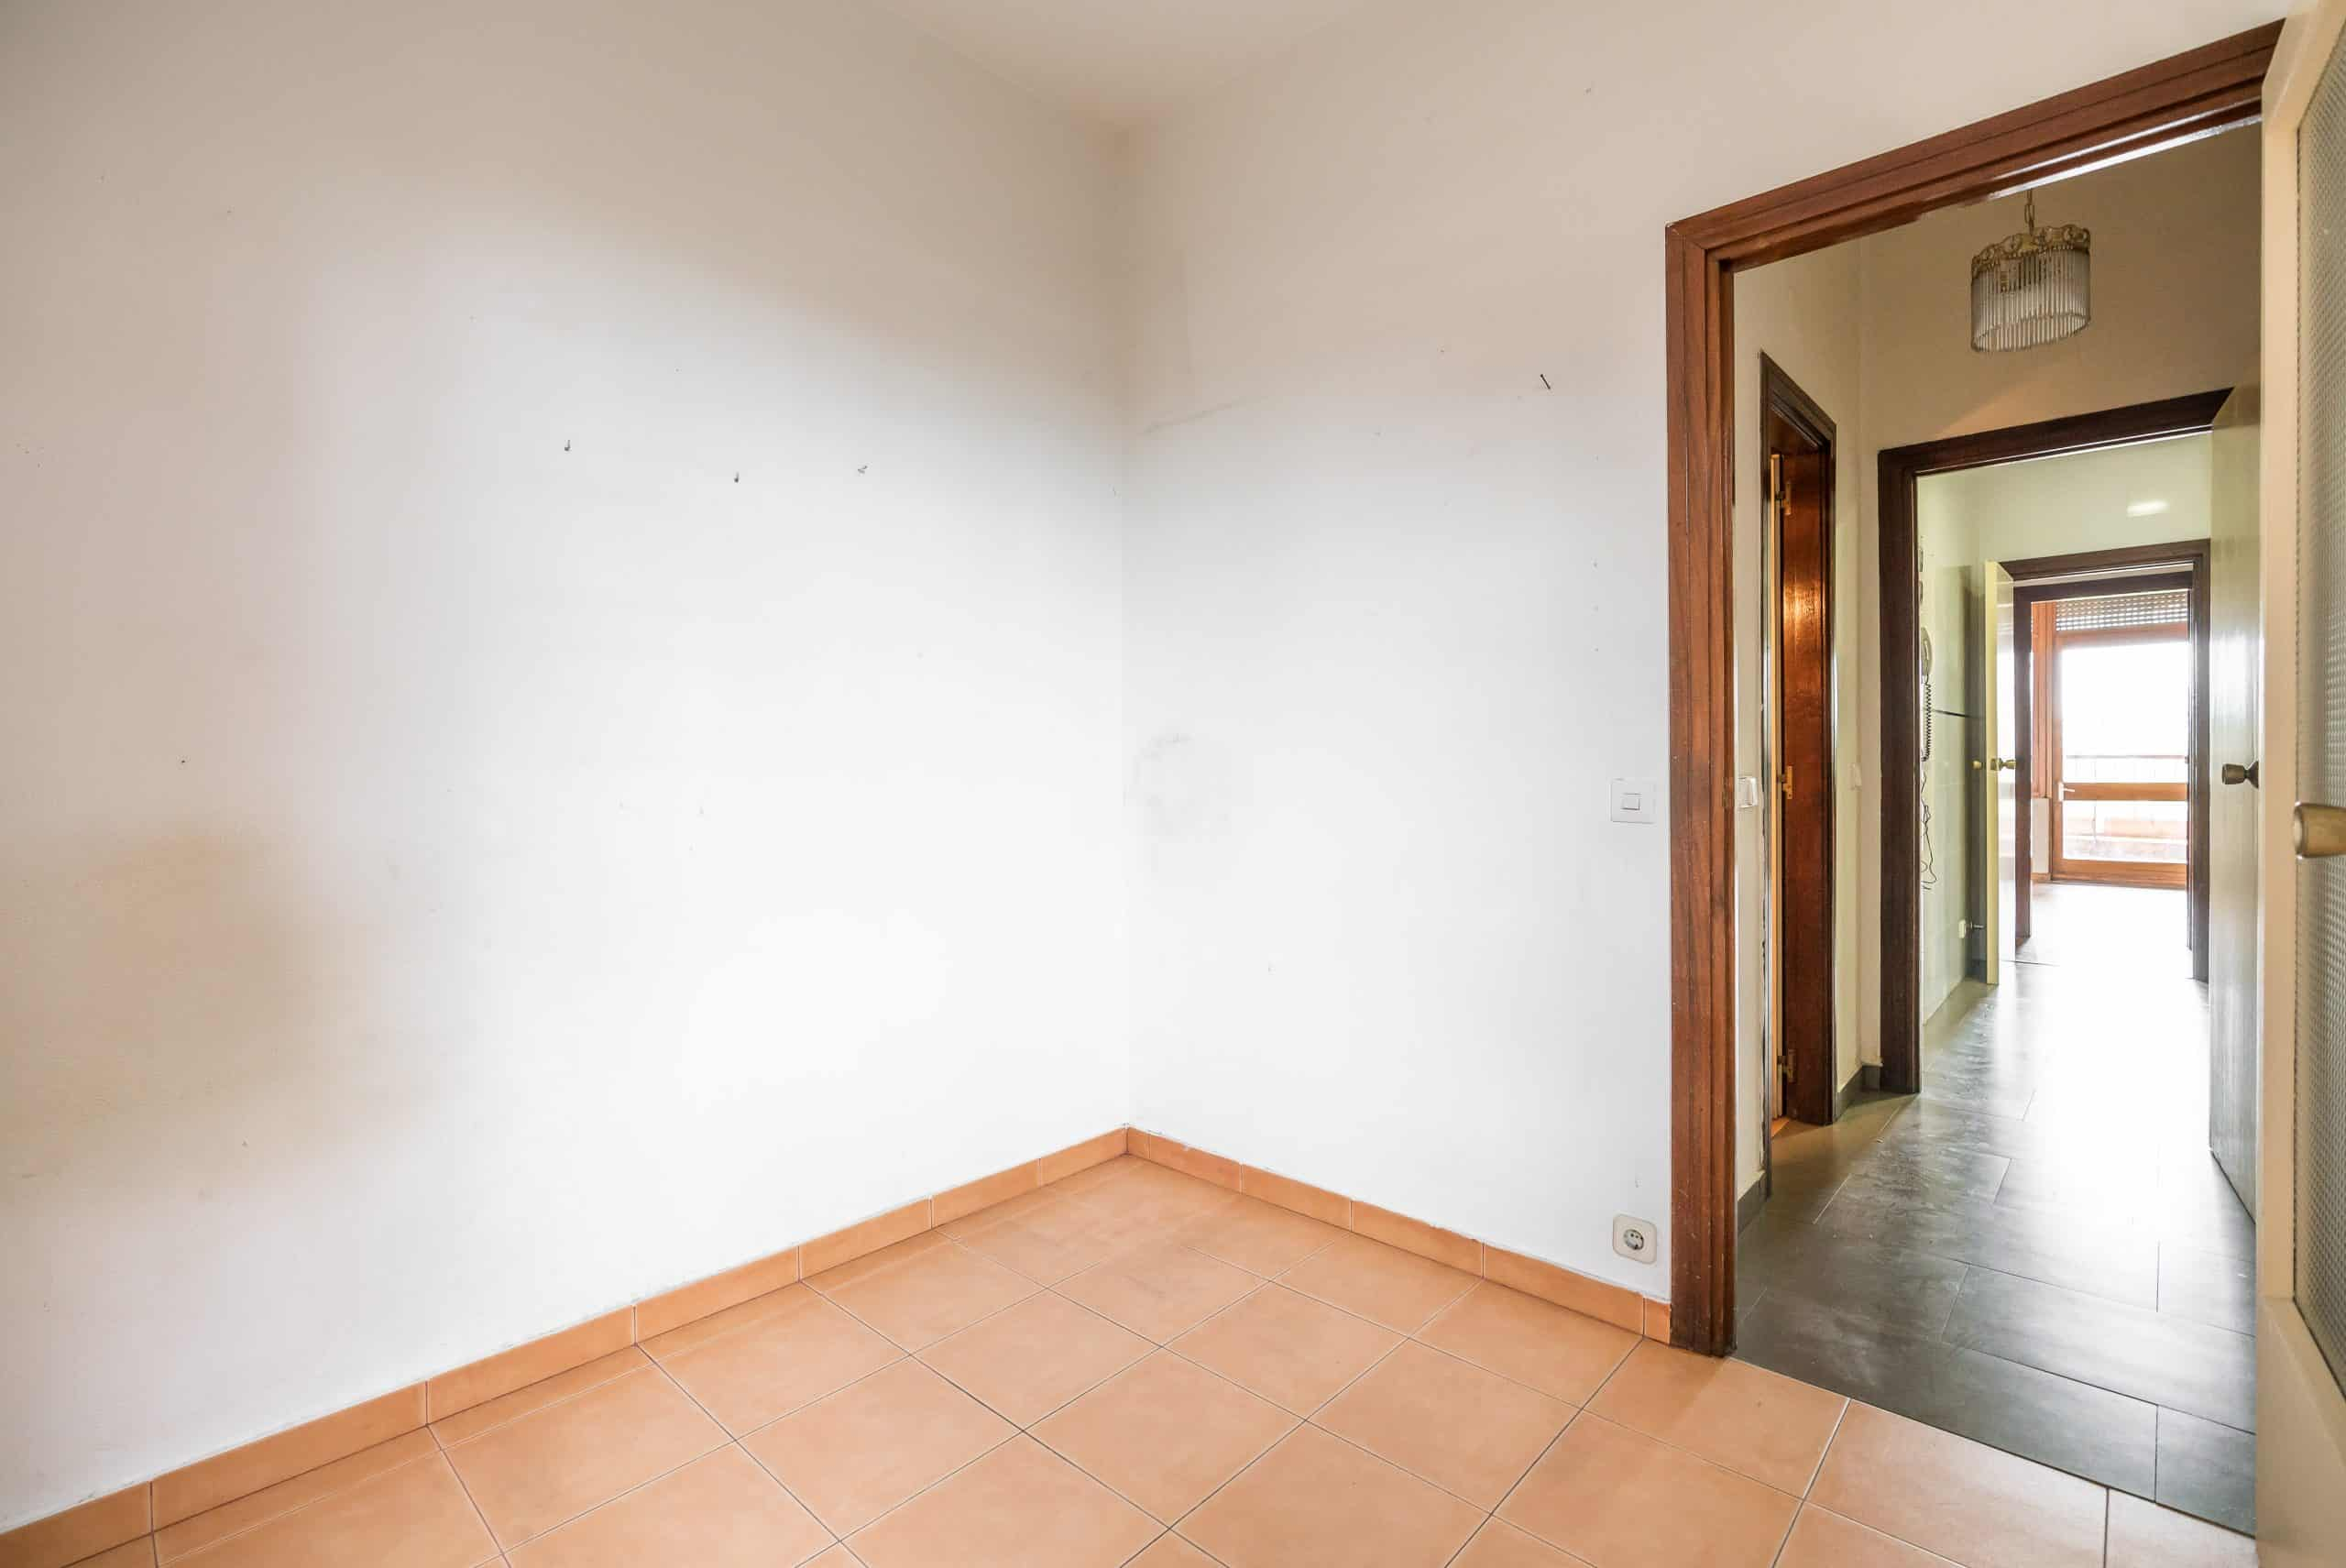 Agencia Inmobiliaria de Madrid-FUTUROCASA-Zona ARGANZUELA-EMBAJADORES-LEGAZPI -calle Embajadores- baño 152